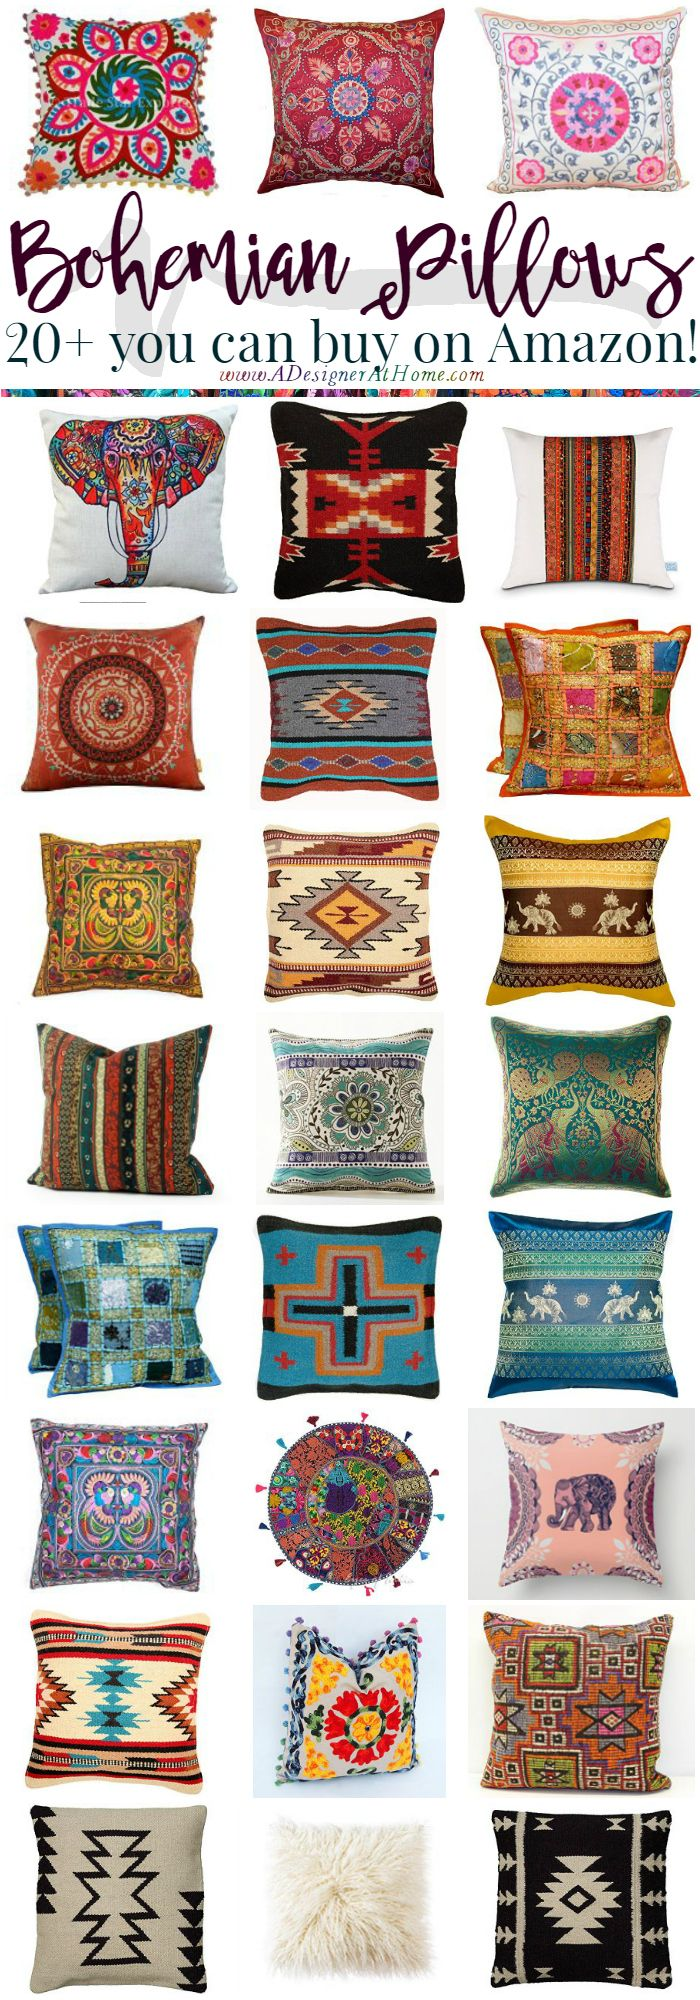 where to buy bohemian pillows